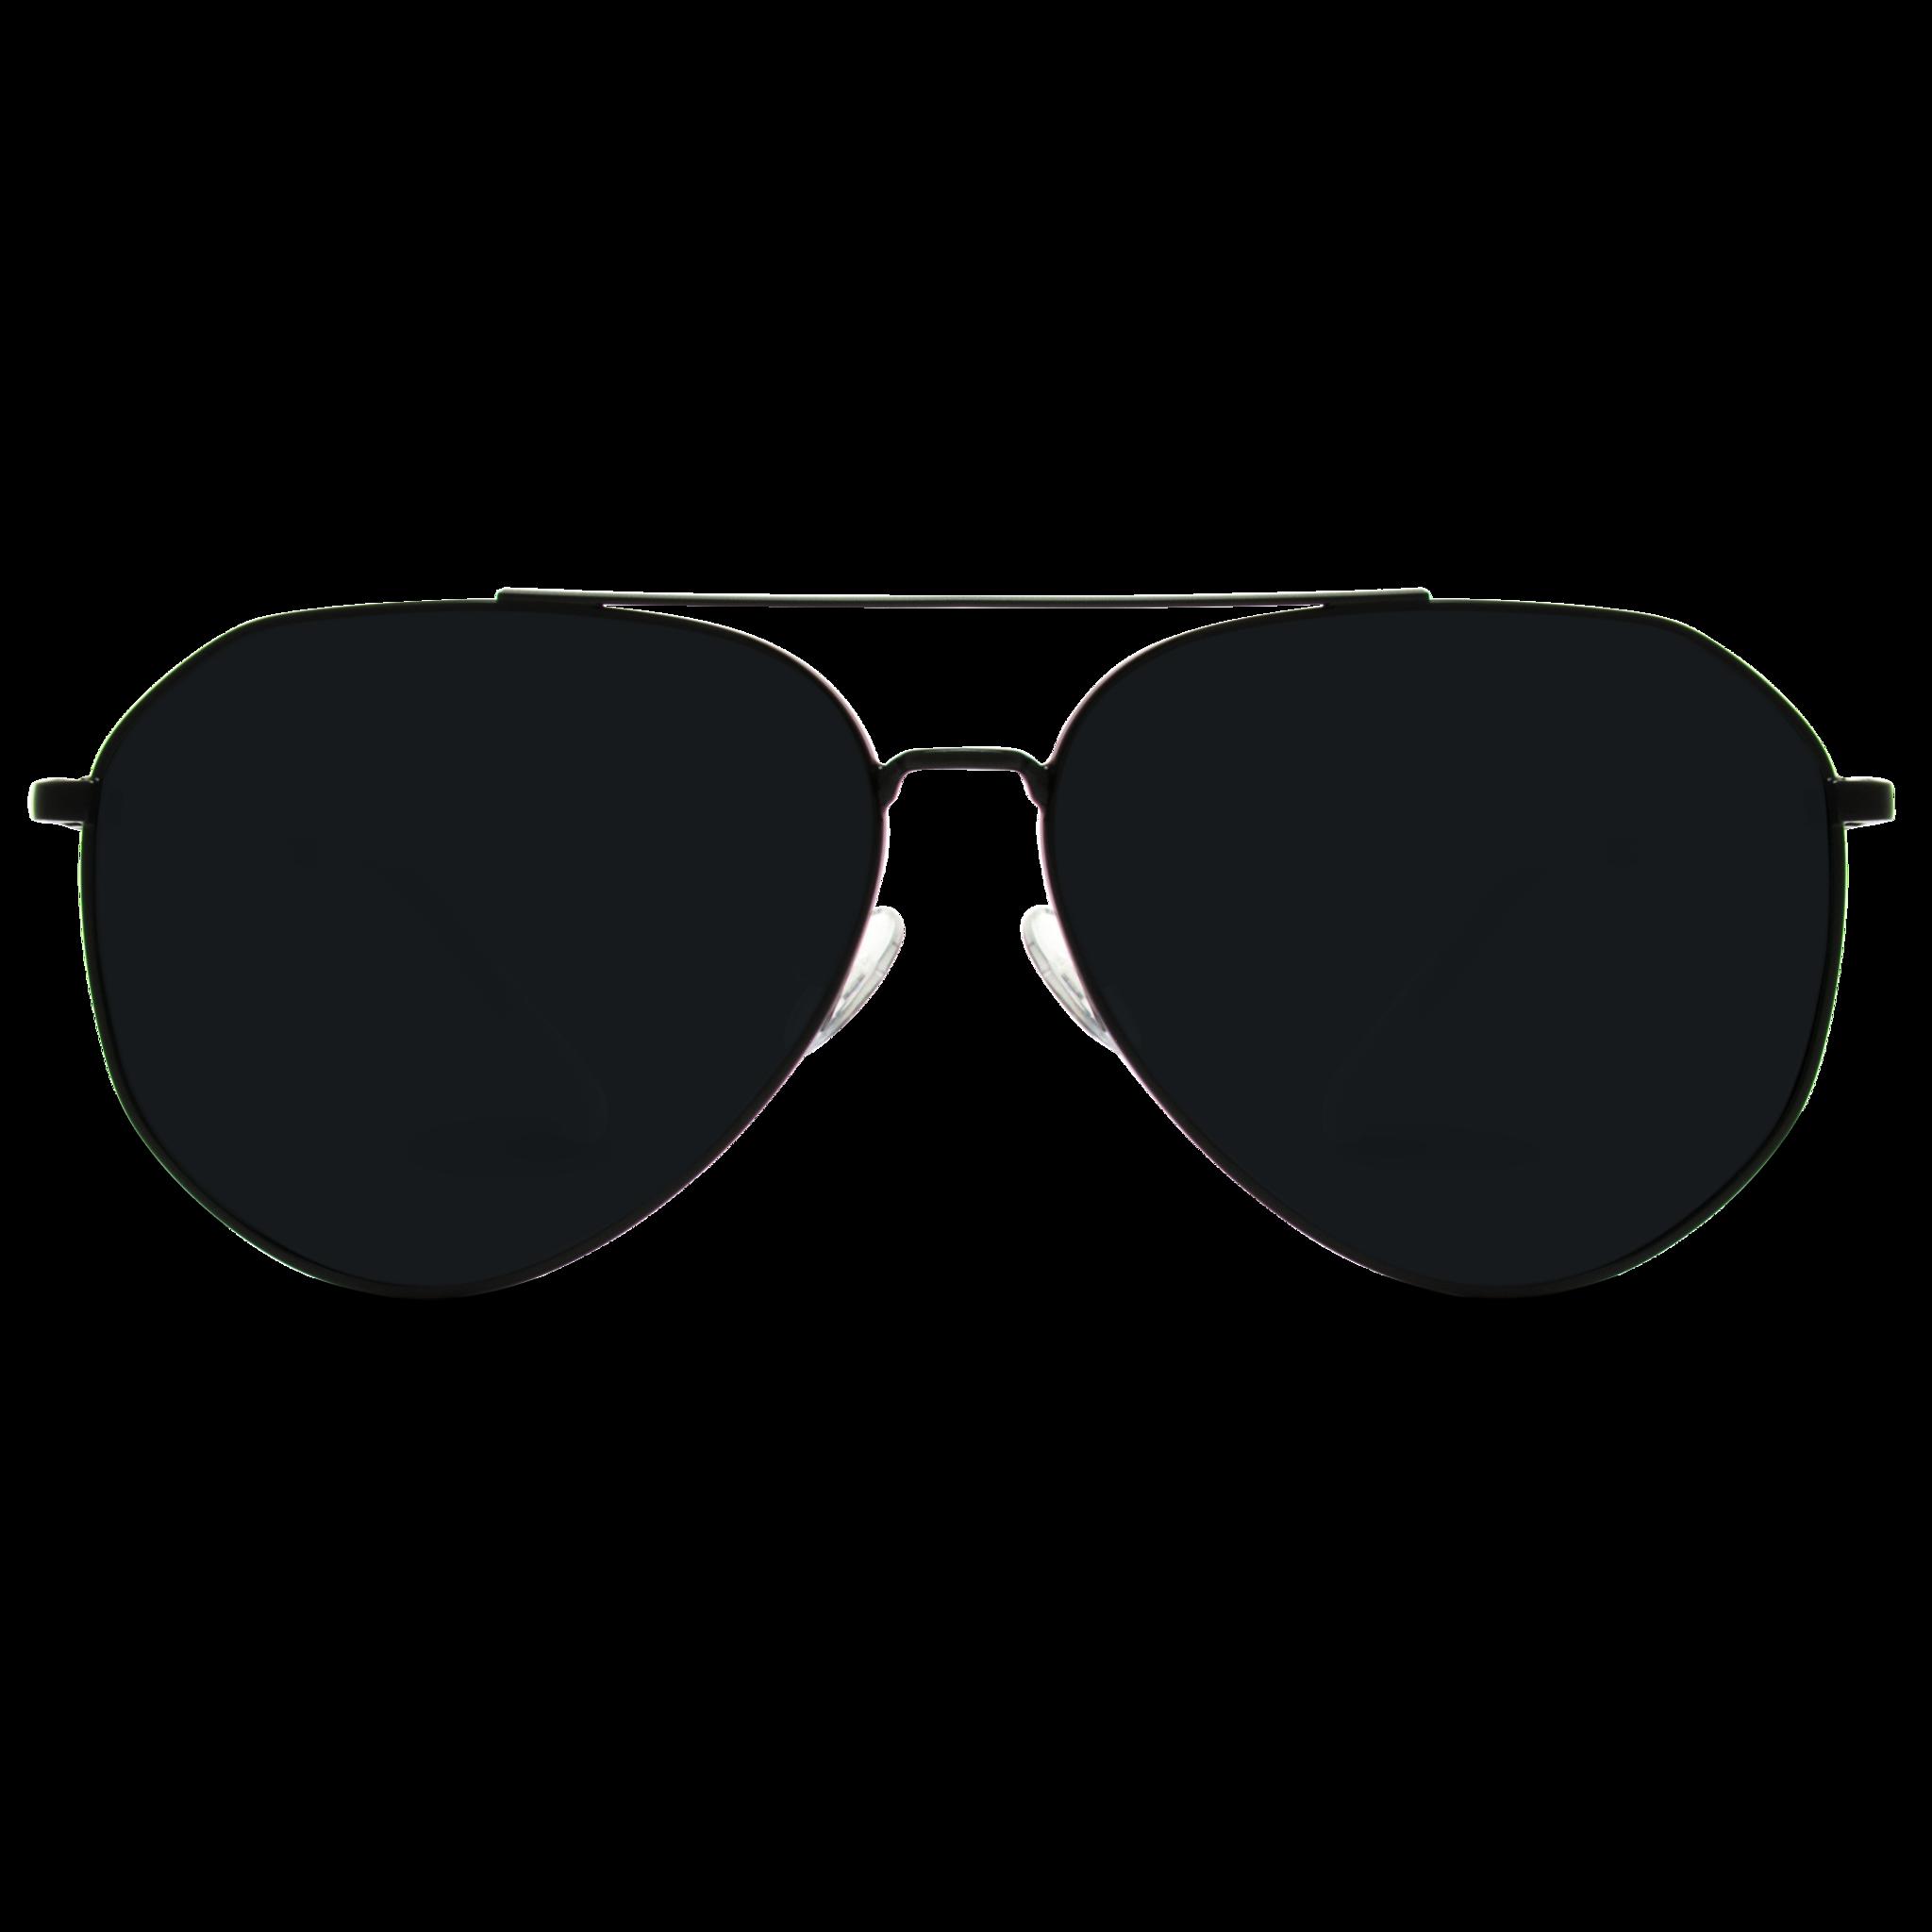 Full Black Classic Polarized Aviator Sunglasses Men Women Classic Geometric Modern Blac Aviator Sunglasses Mens Men Sunglasses Fashion Best Aviator Sunglasses